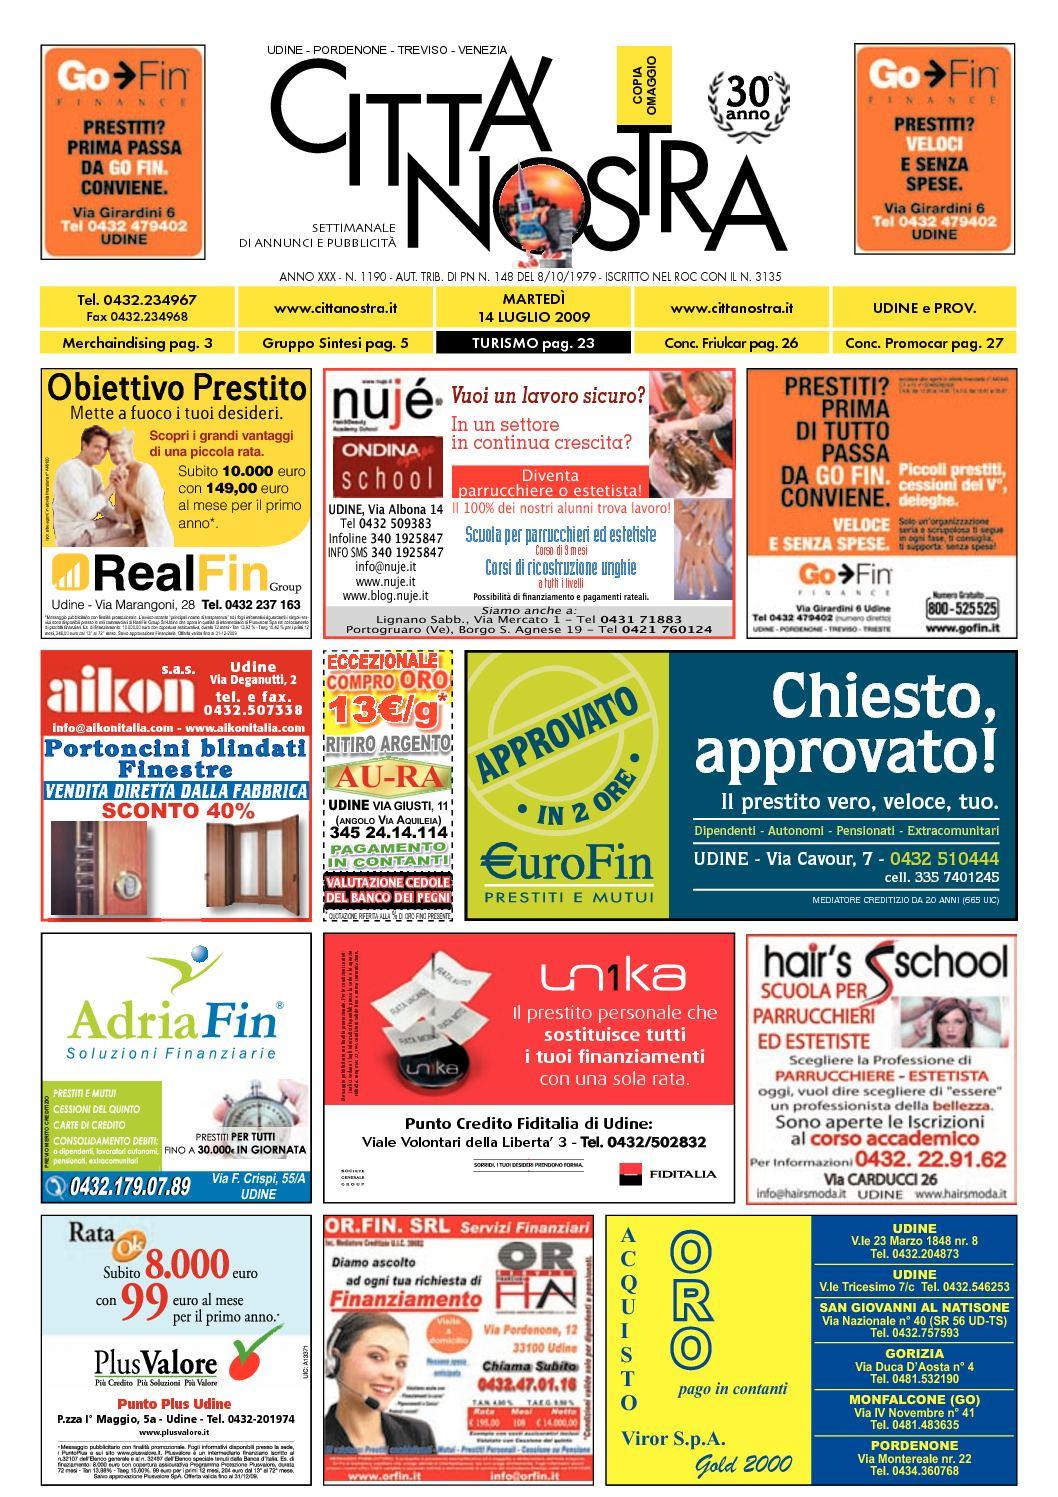 Calaméo Citt Nostra Udine Del 14 07 2009 N 1190